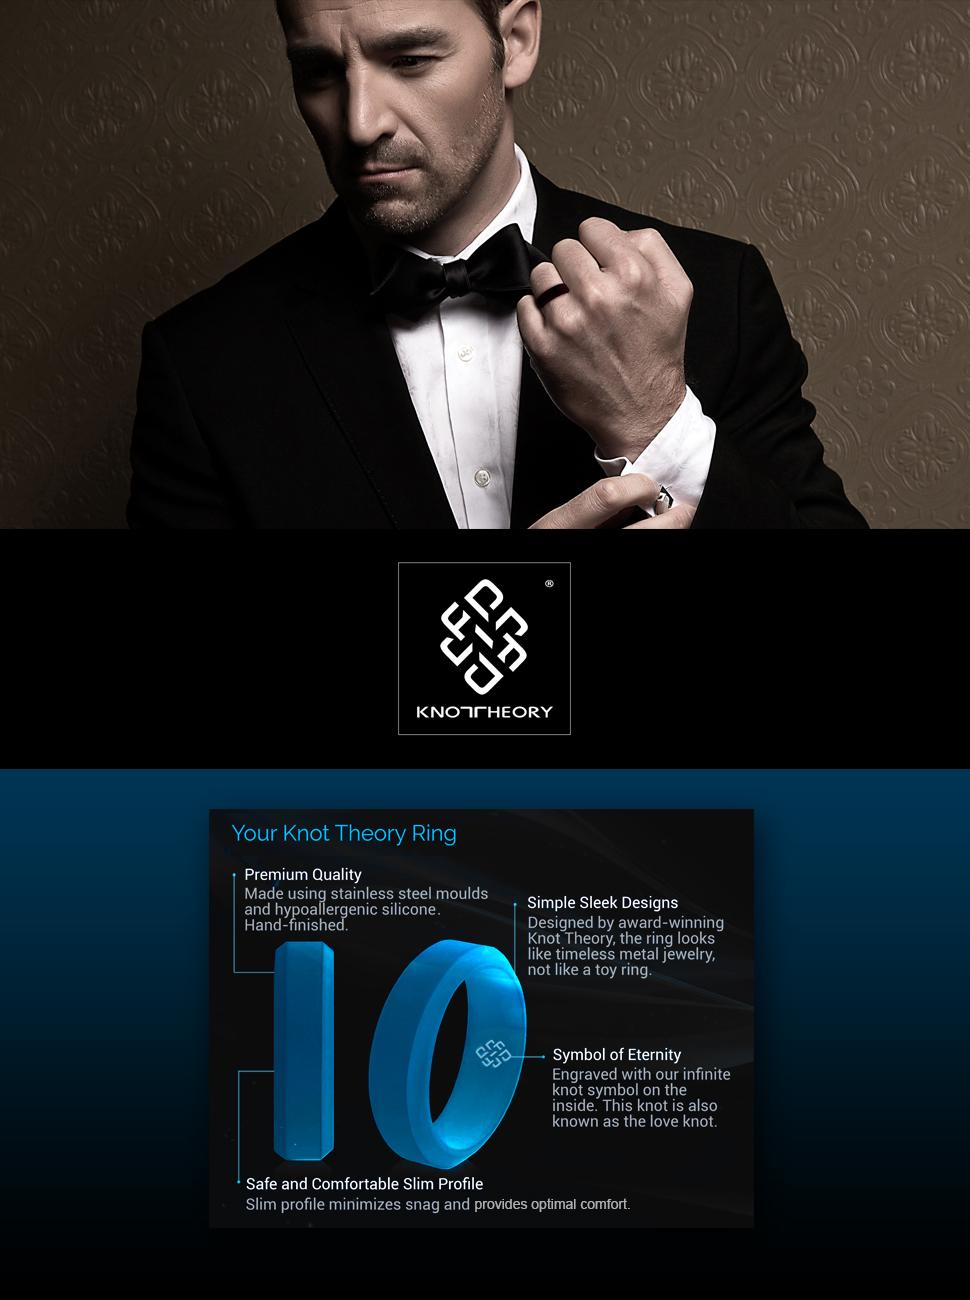 Amazoncom Knot Theory Silicone Wedding Ringx26056mm Band for